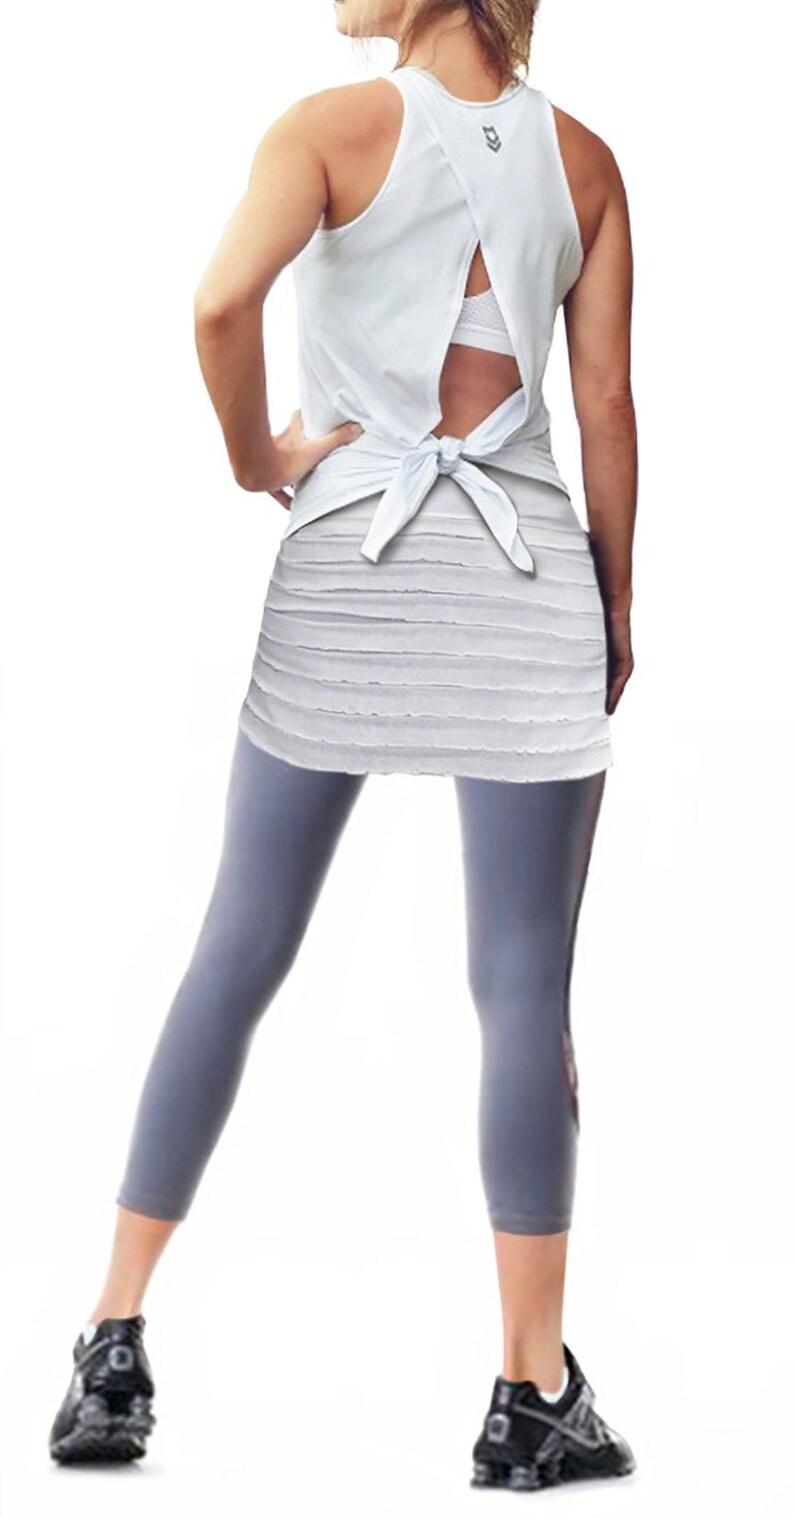 NEW VANILLA RUFFLE Lauren Bashawl Booty Shawl shirt extender image 0